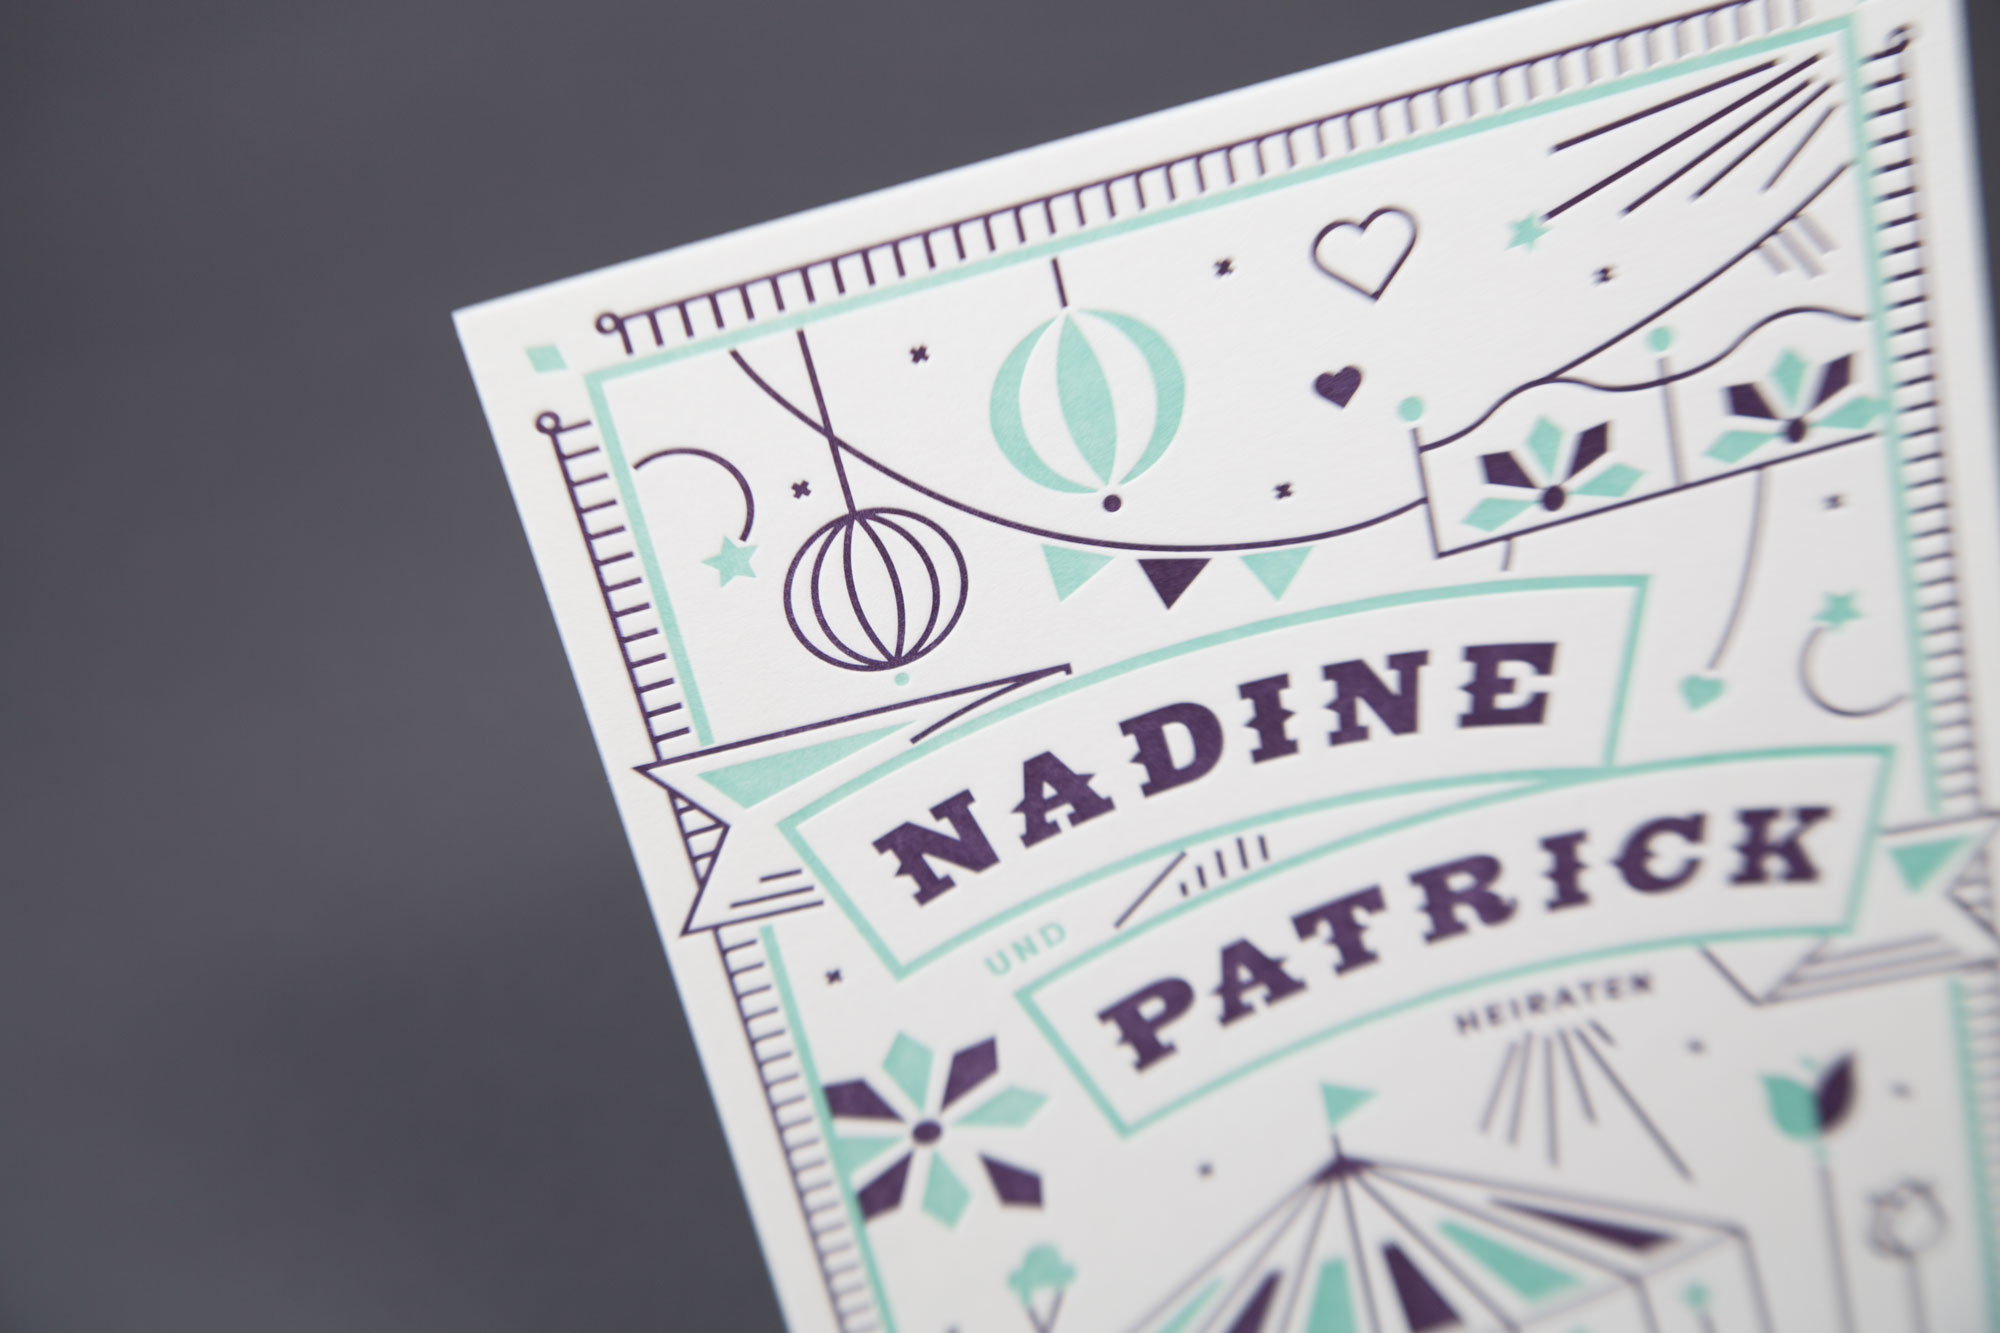 nadinepatrick_03